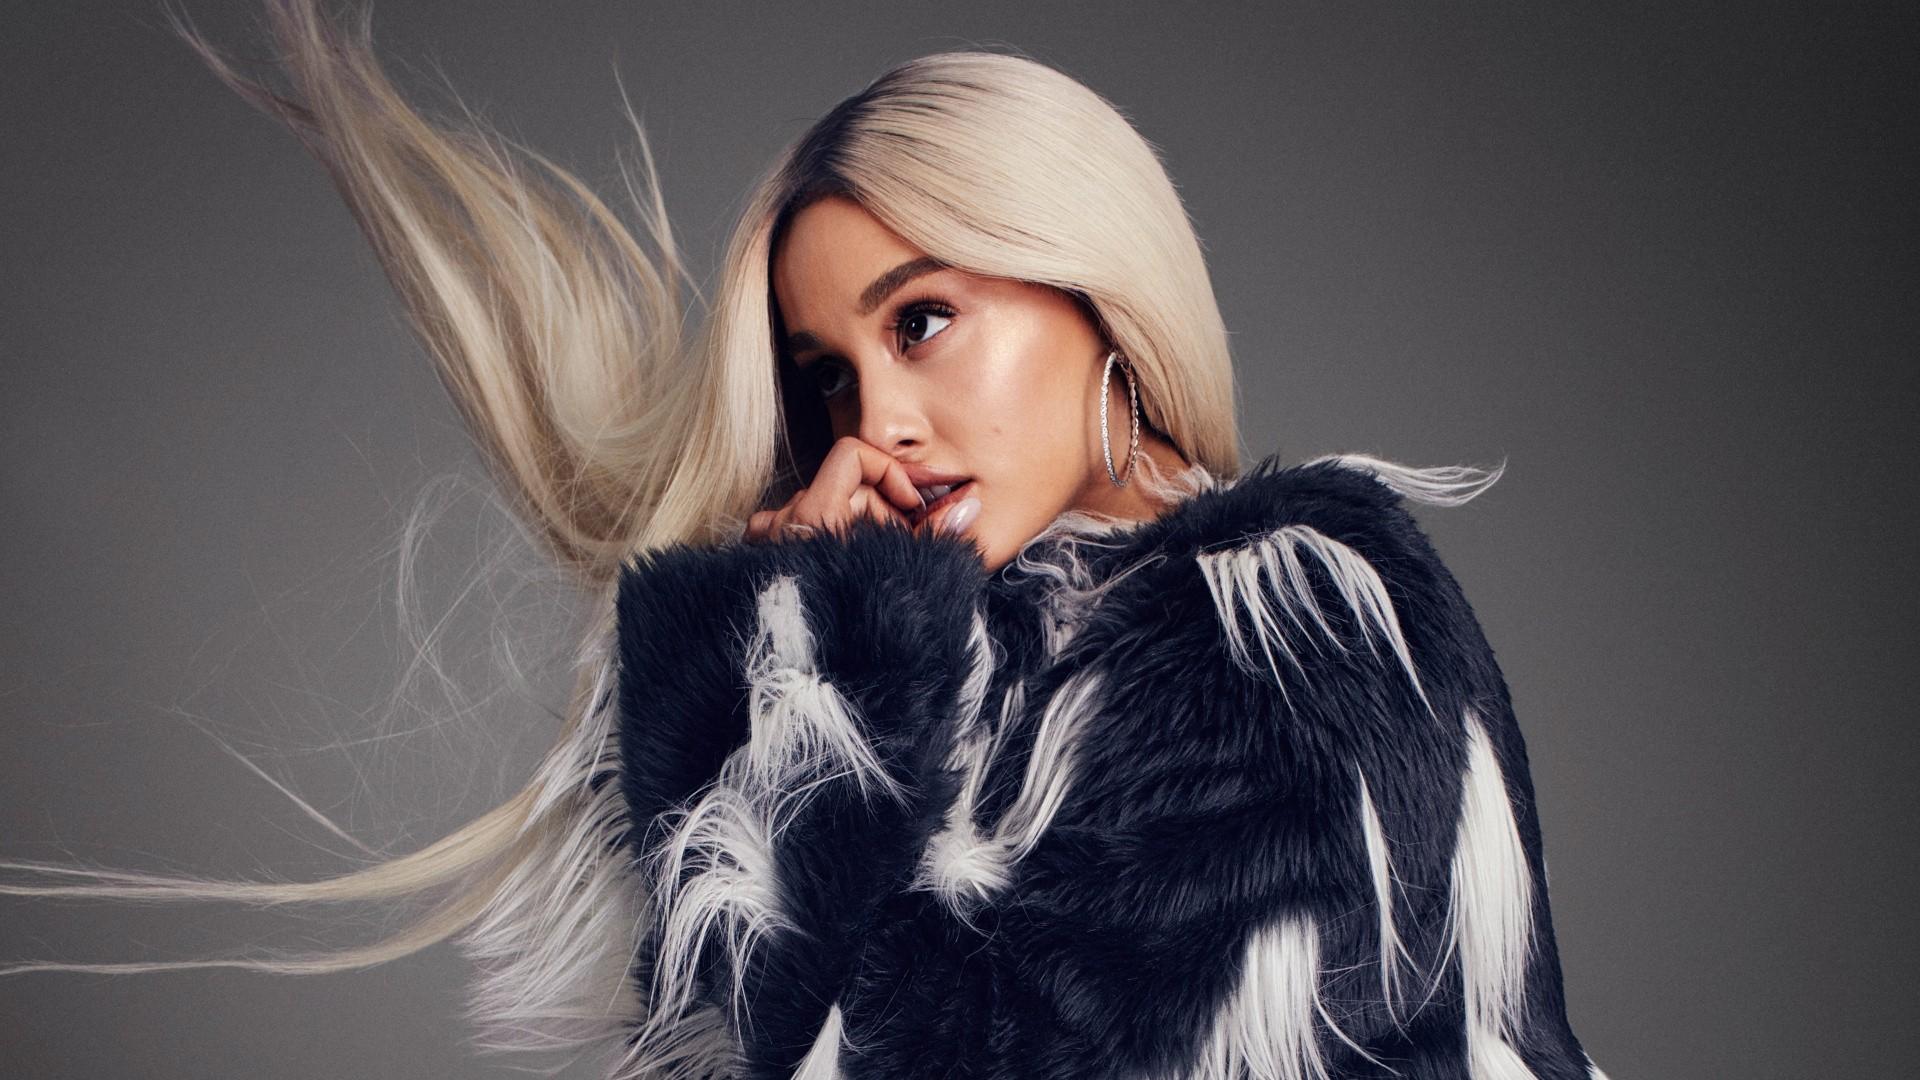 Ariana Grande Cool HD Wallpaper